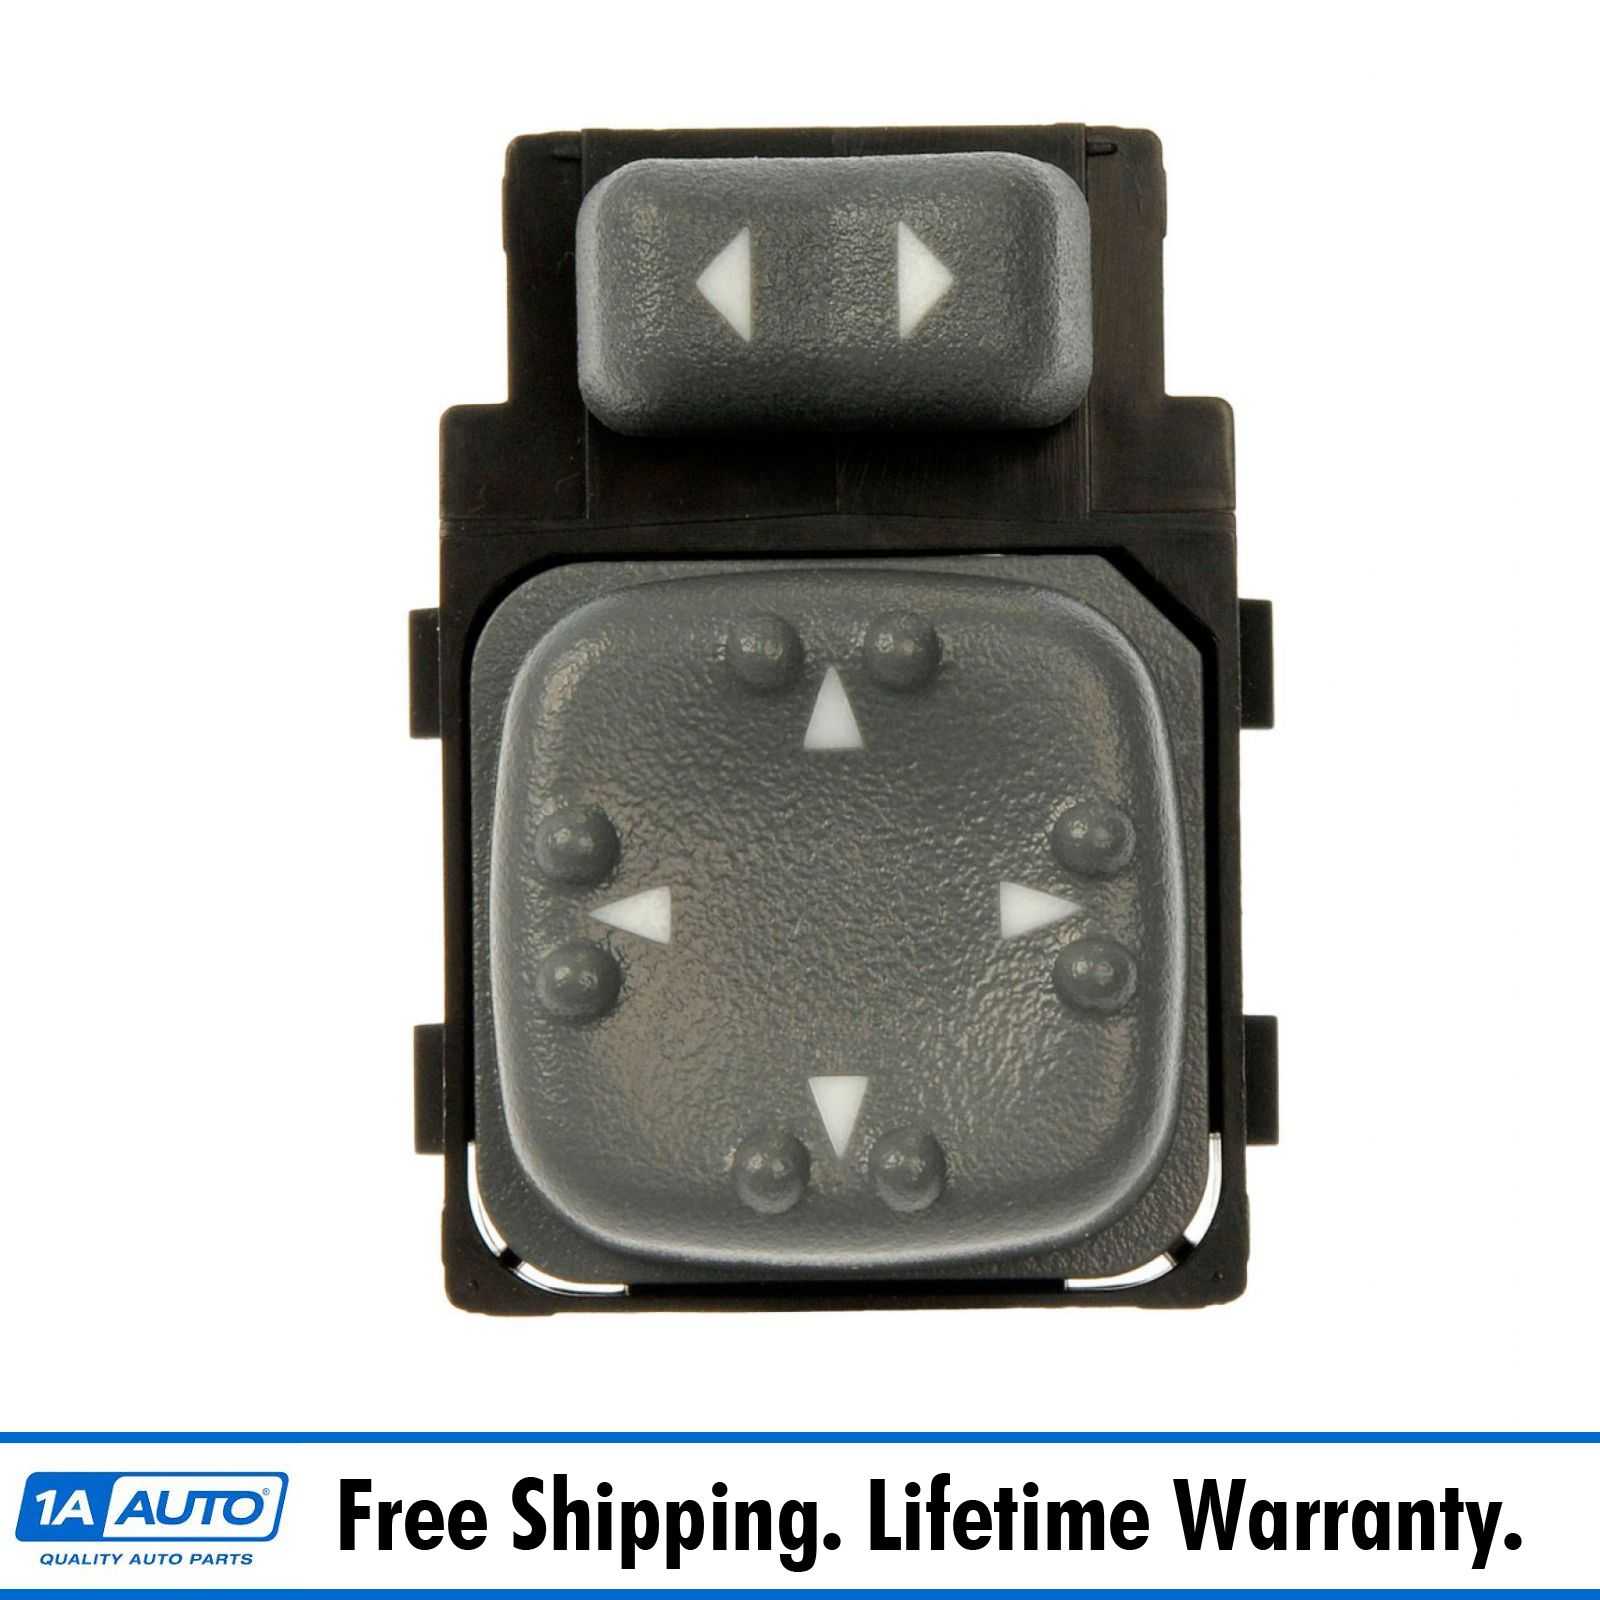 Power Mirror Control Switch Fits Blazer S10 Sonoma Bravada Pickup Truck Left